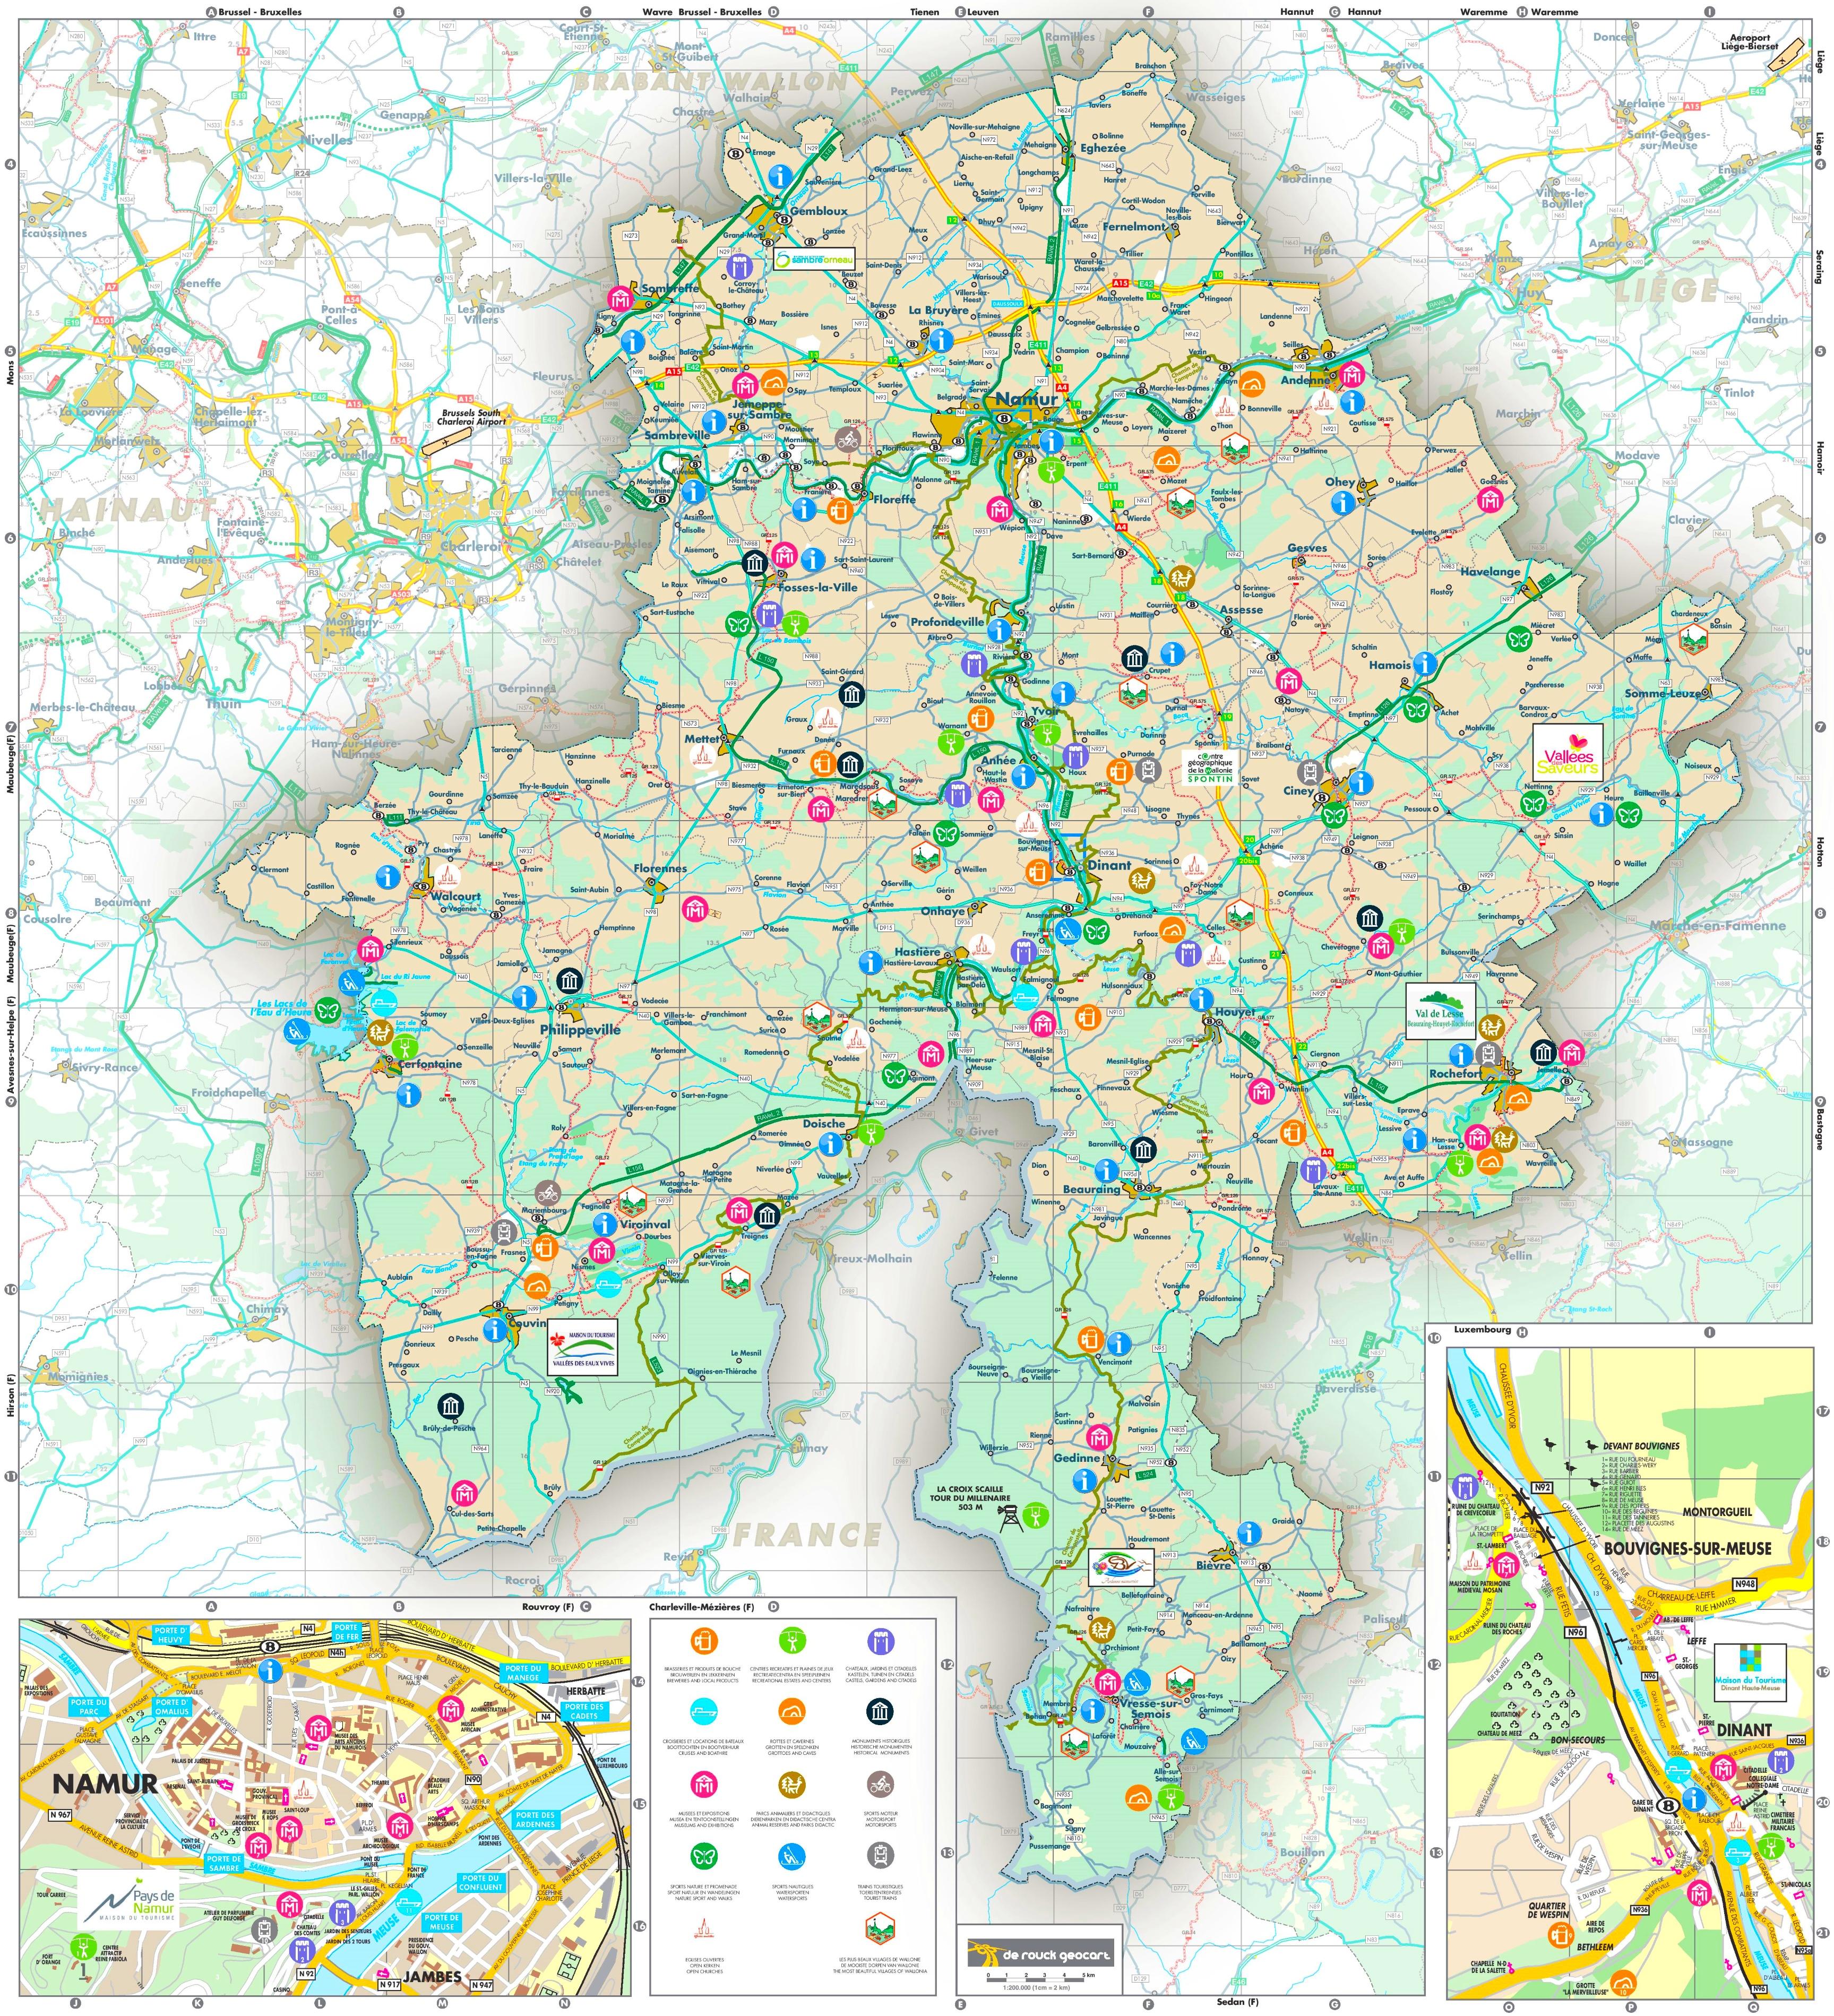 Namur Maps Belgium Maps of Namur Namen